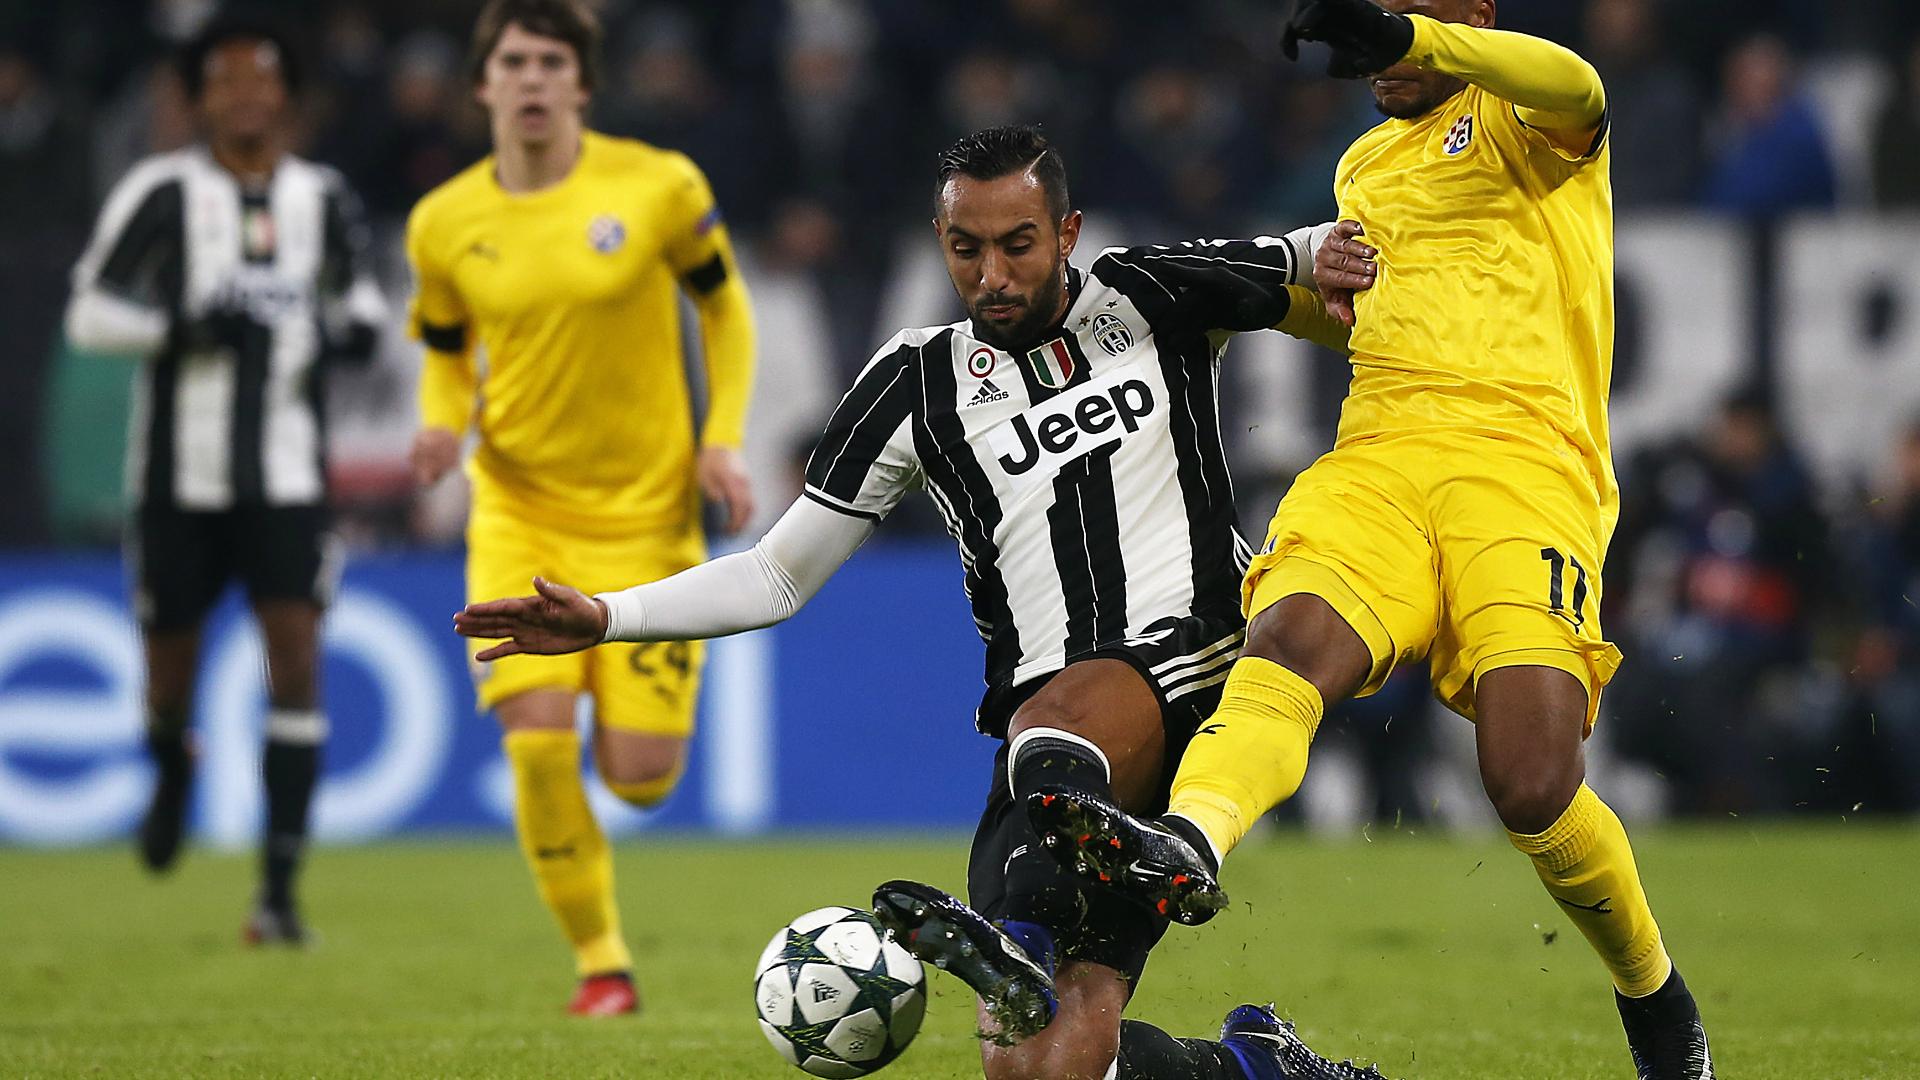 Mehdi Benatia Fernandes Juventus Dinamo Zagabria